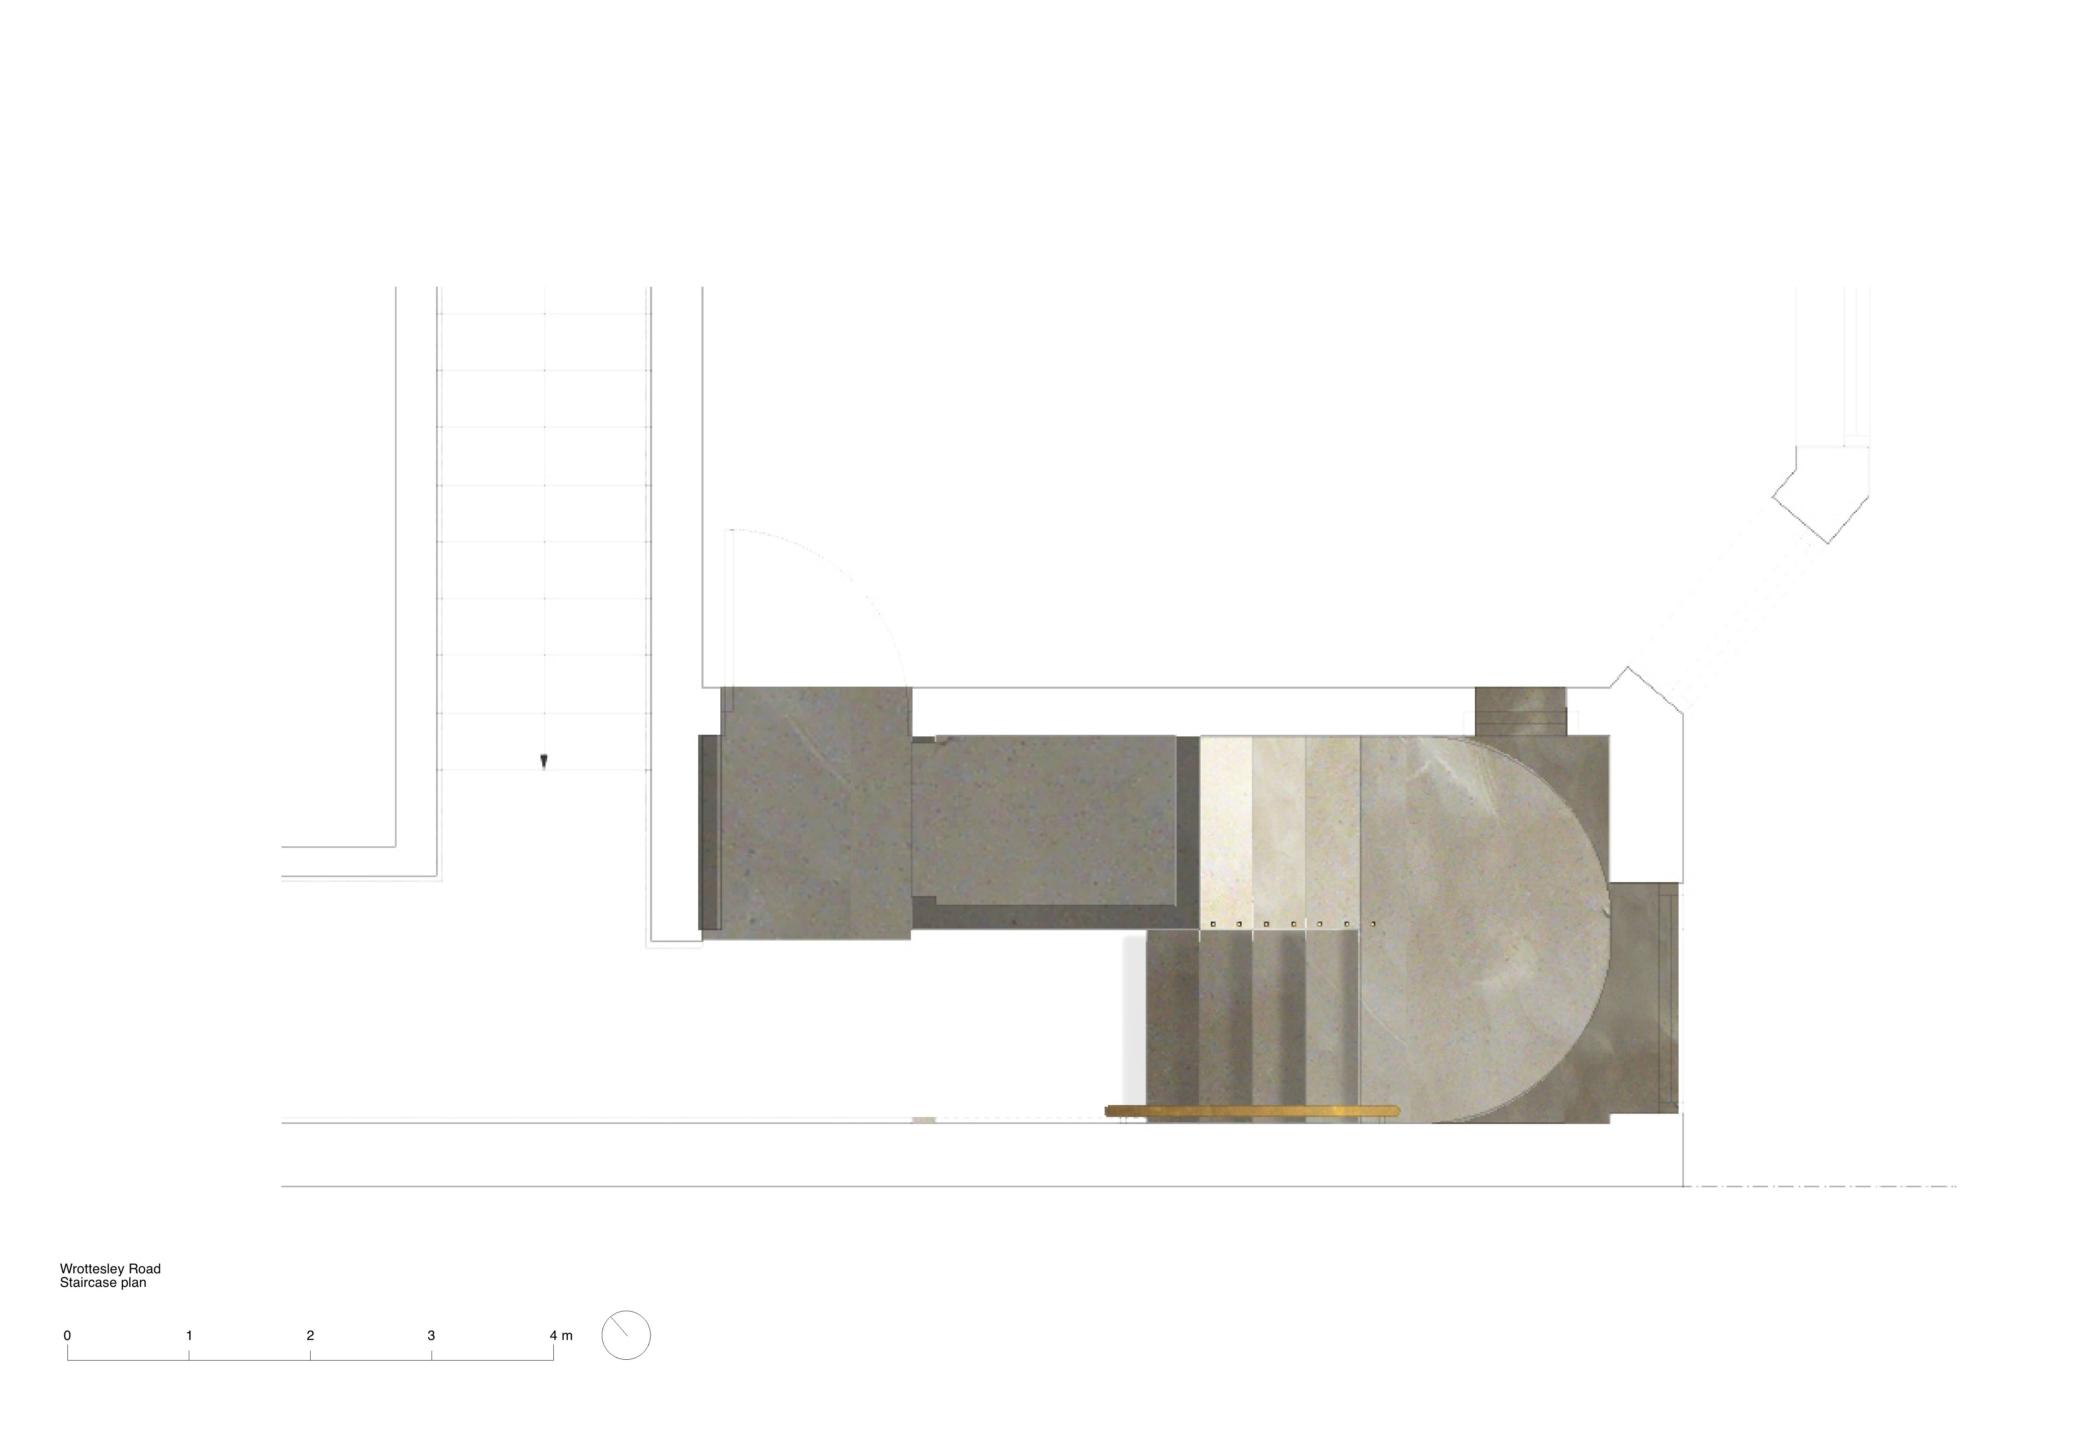 Wrottesley Road colour plan